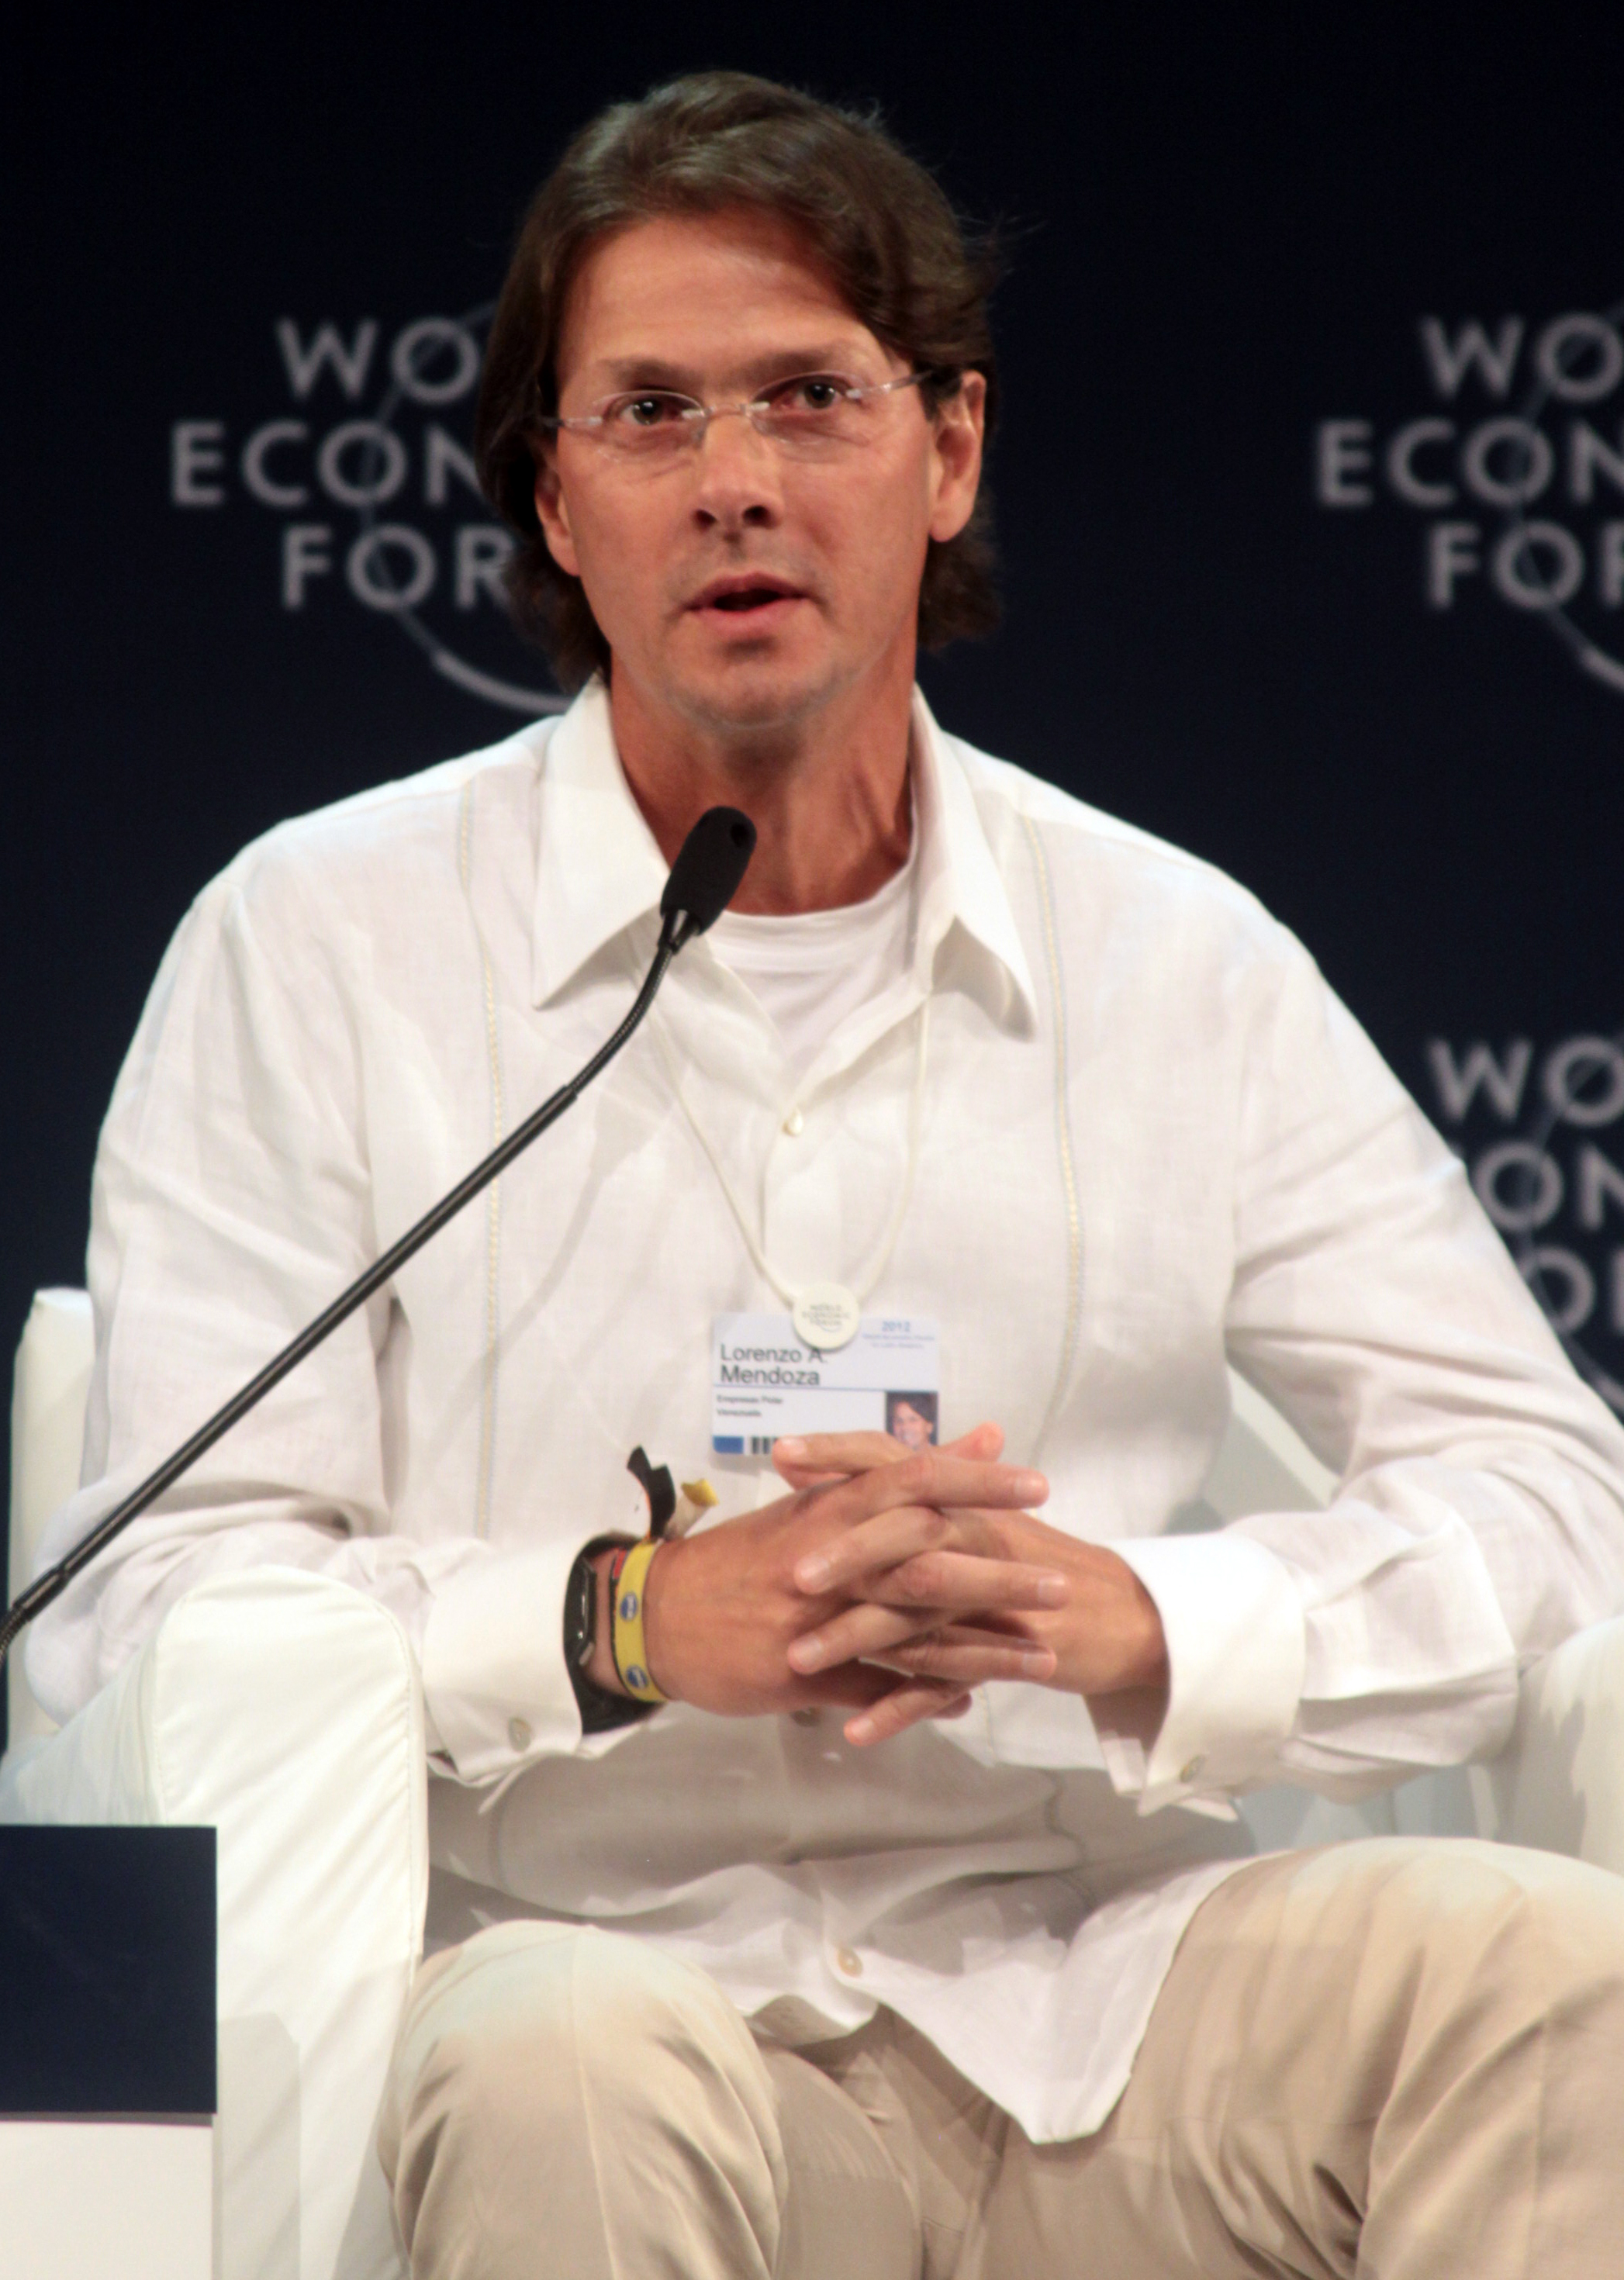 Lorenzo_Mendoza_-_World_Economic_Forum_on_Latin_America_2012.jpg